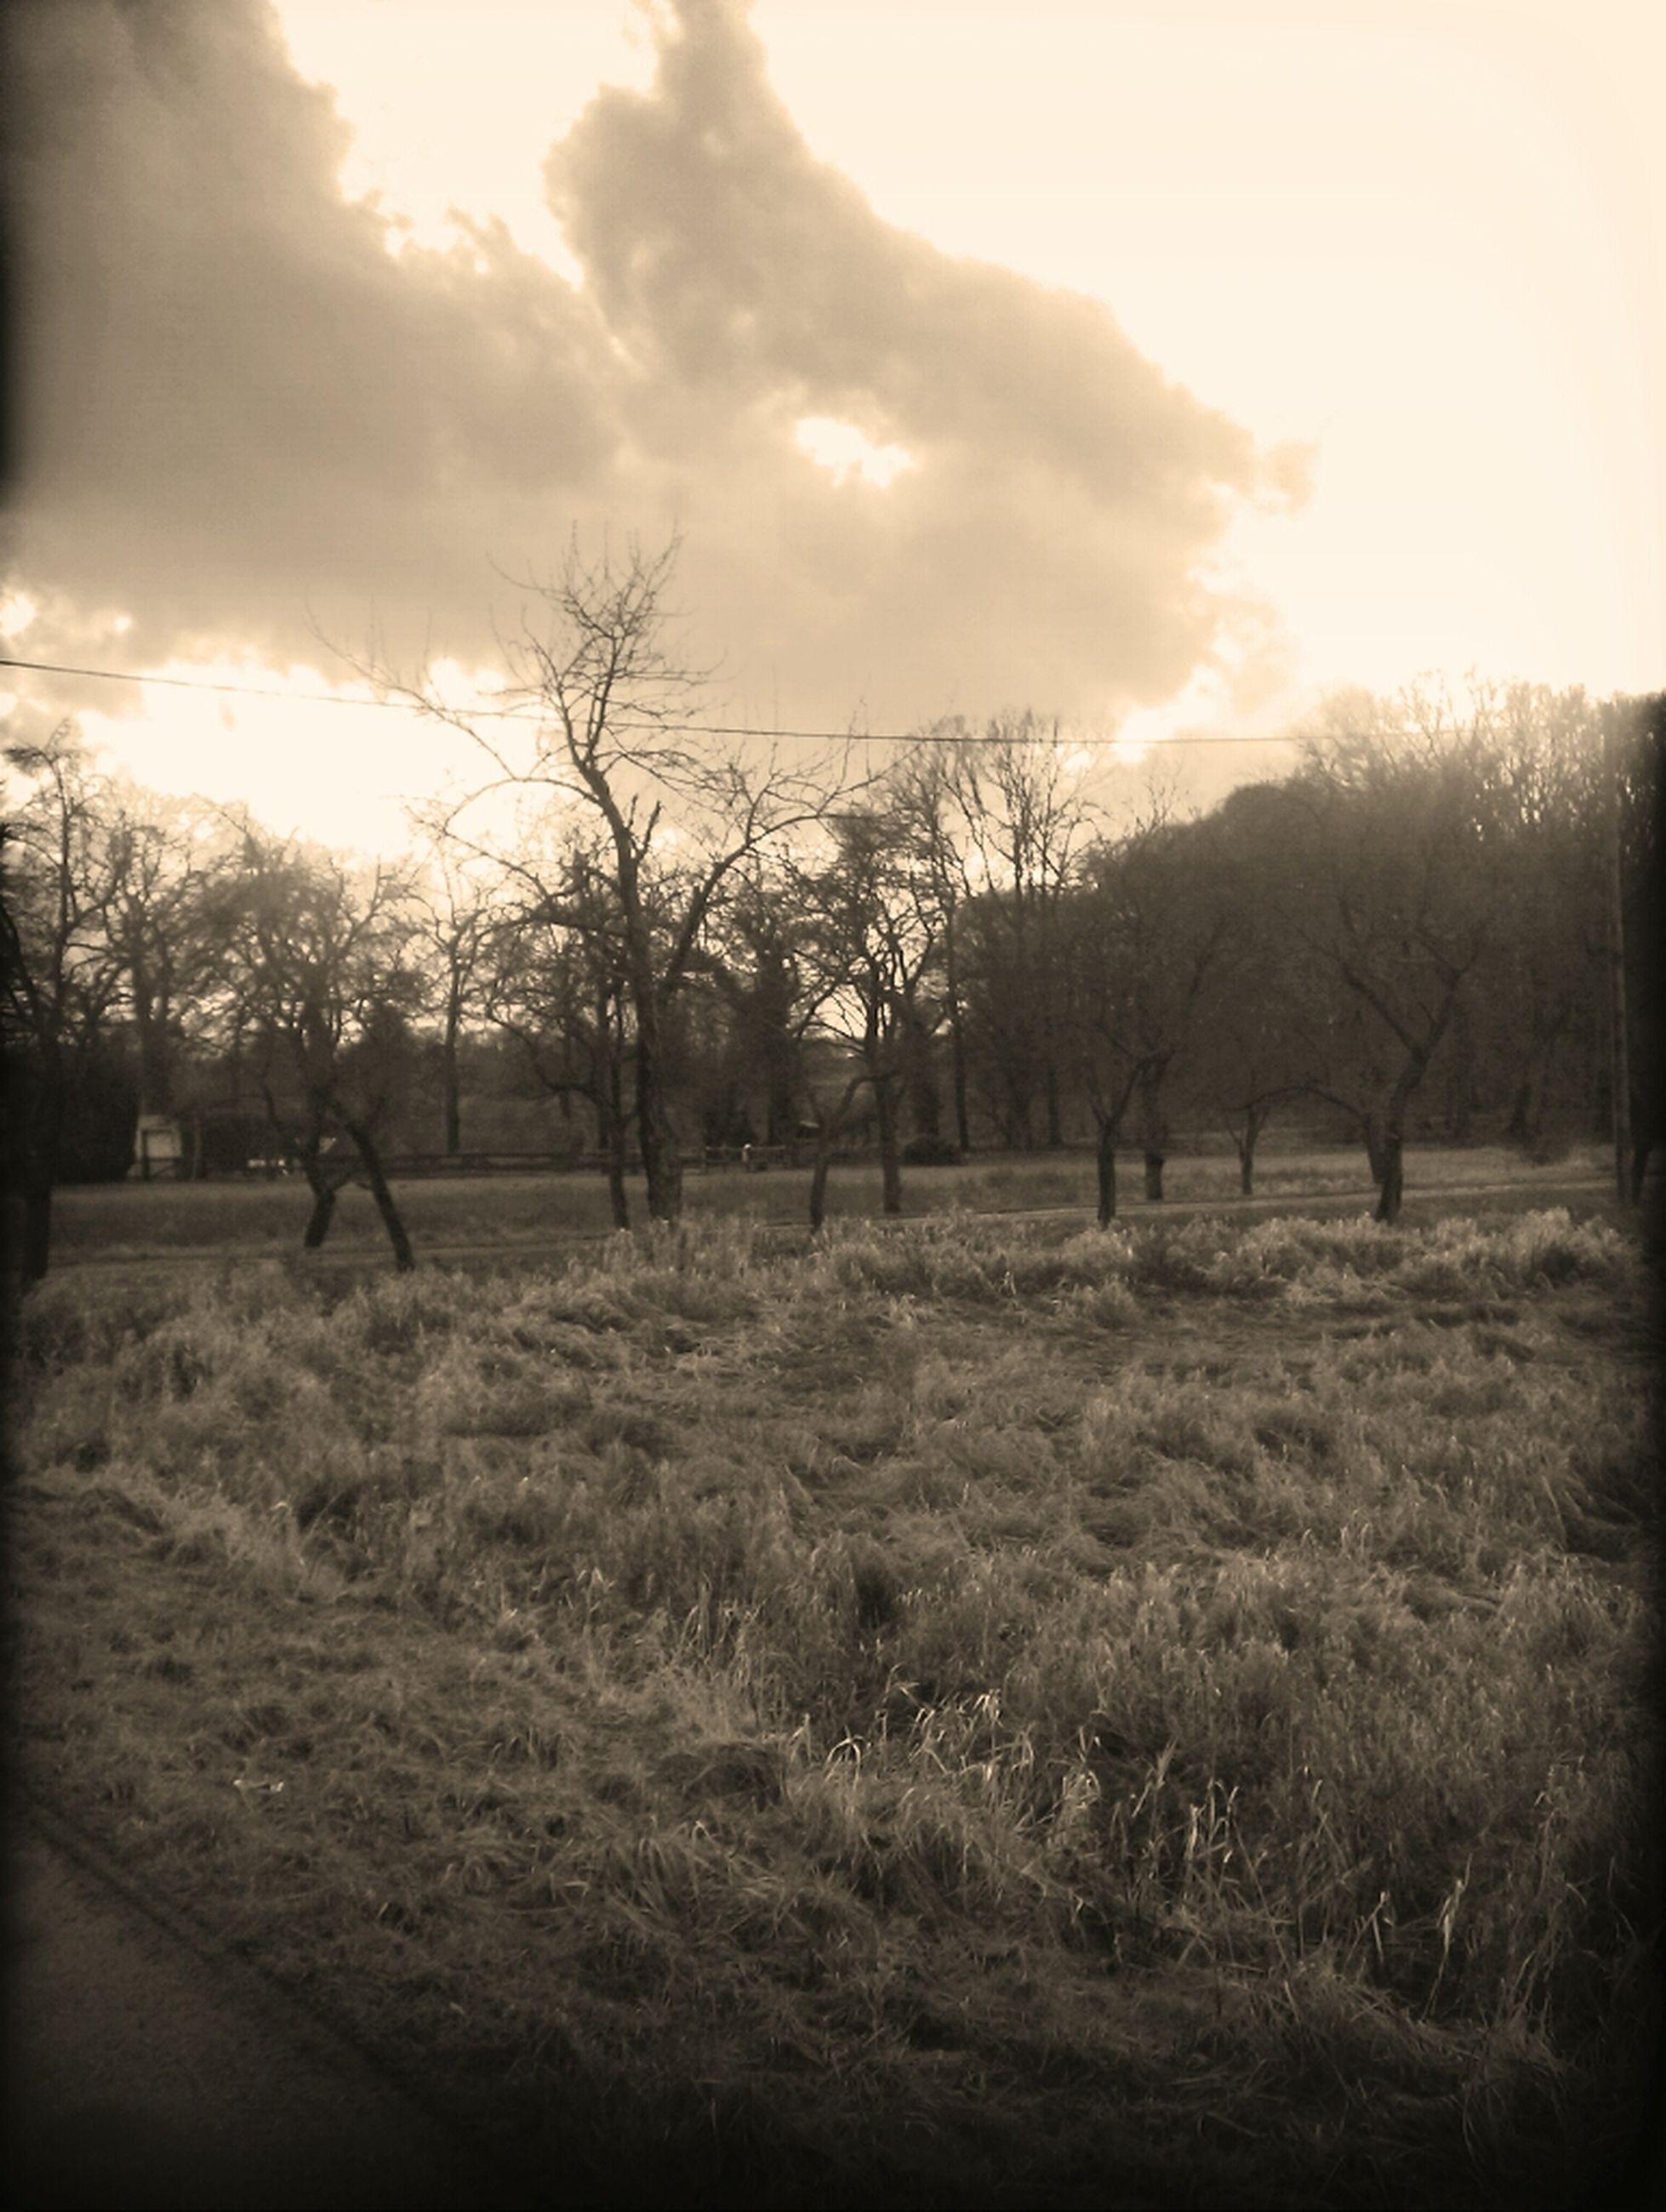 field, tree, landscape, tranquility, tranquil scene, grass, sky, nature, sunset, scenics, beauty in nature, grassy, rural scene, bare tree, sun, growth, sunlight, fence, non-urban scene, no people